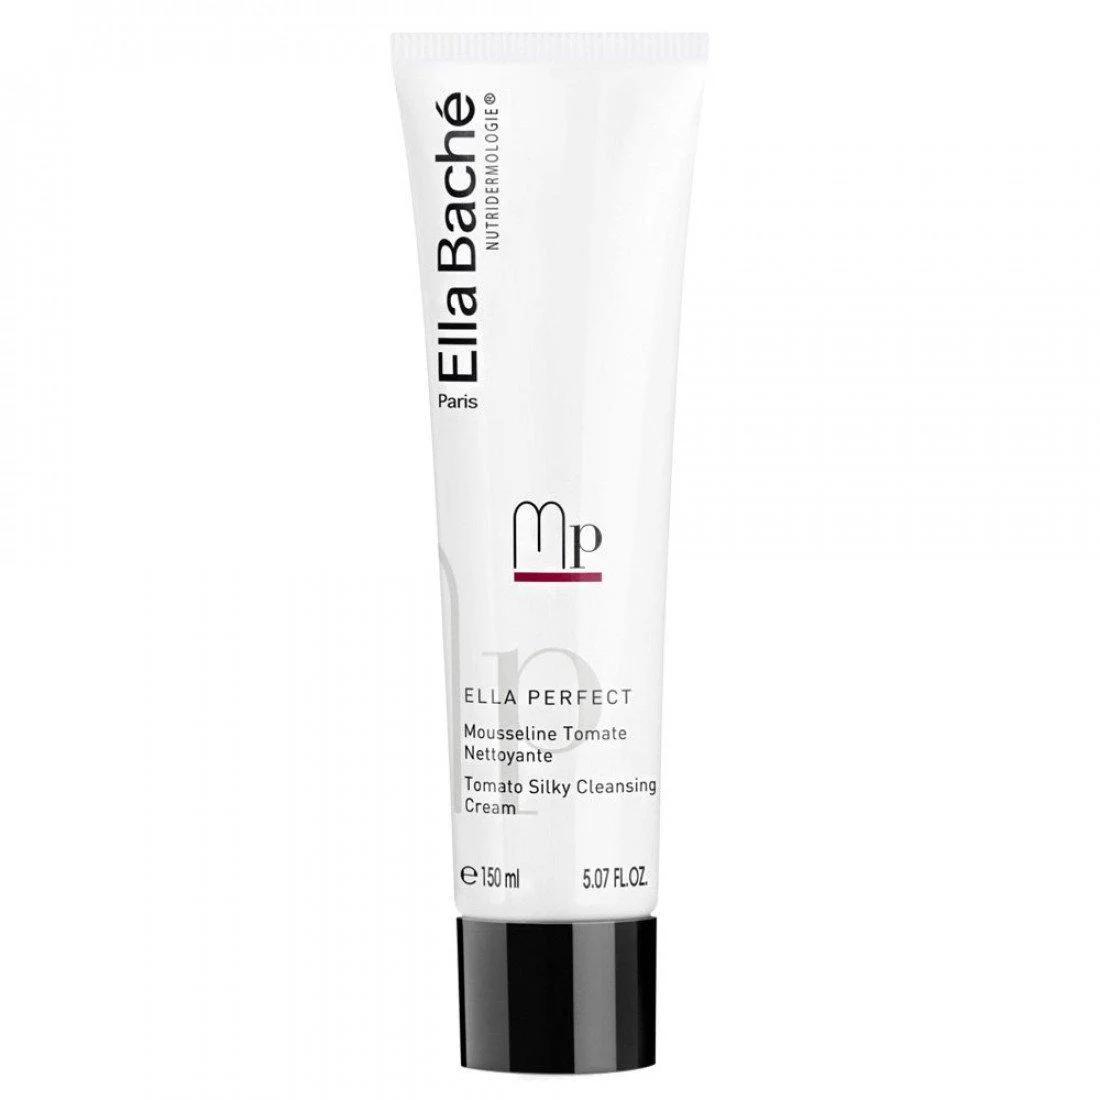 Ella Bache Ella Perfect Makeup Removal Tomato Silky Cleansing Cream Очищающий мусс для умывания Томат 150 мл